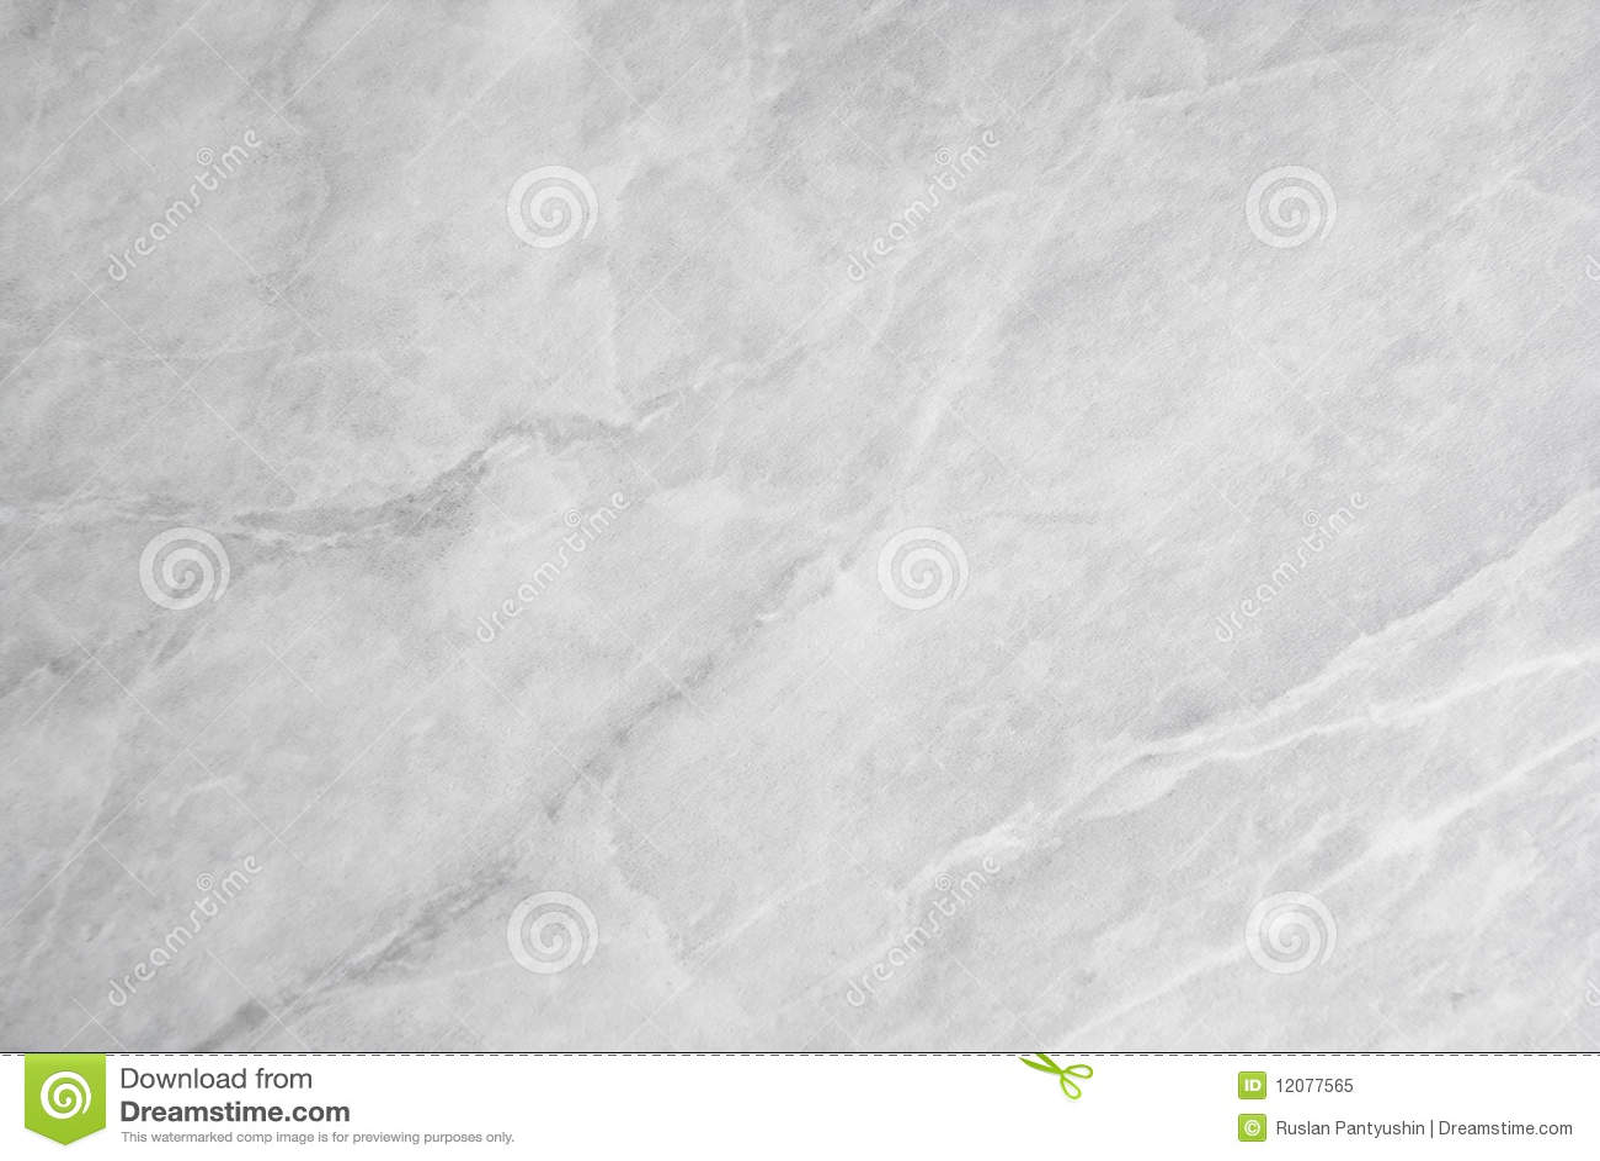 plaque de marbre image stock image du rectangulaire. Black Bedroom Furniture Sets. Home Design Ideas